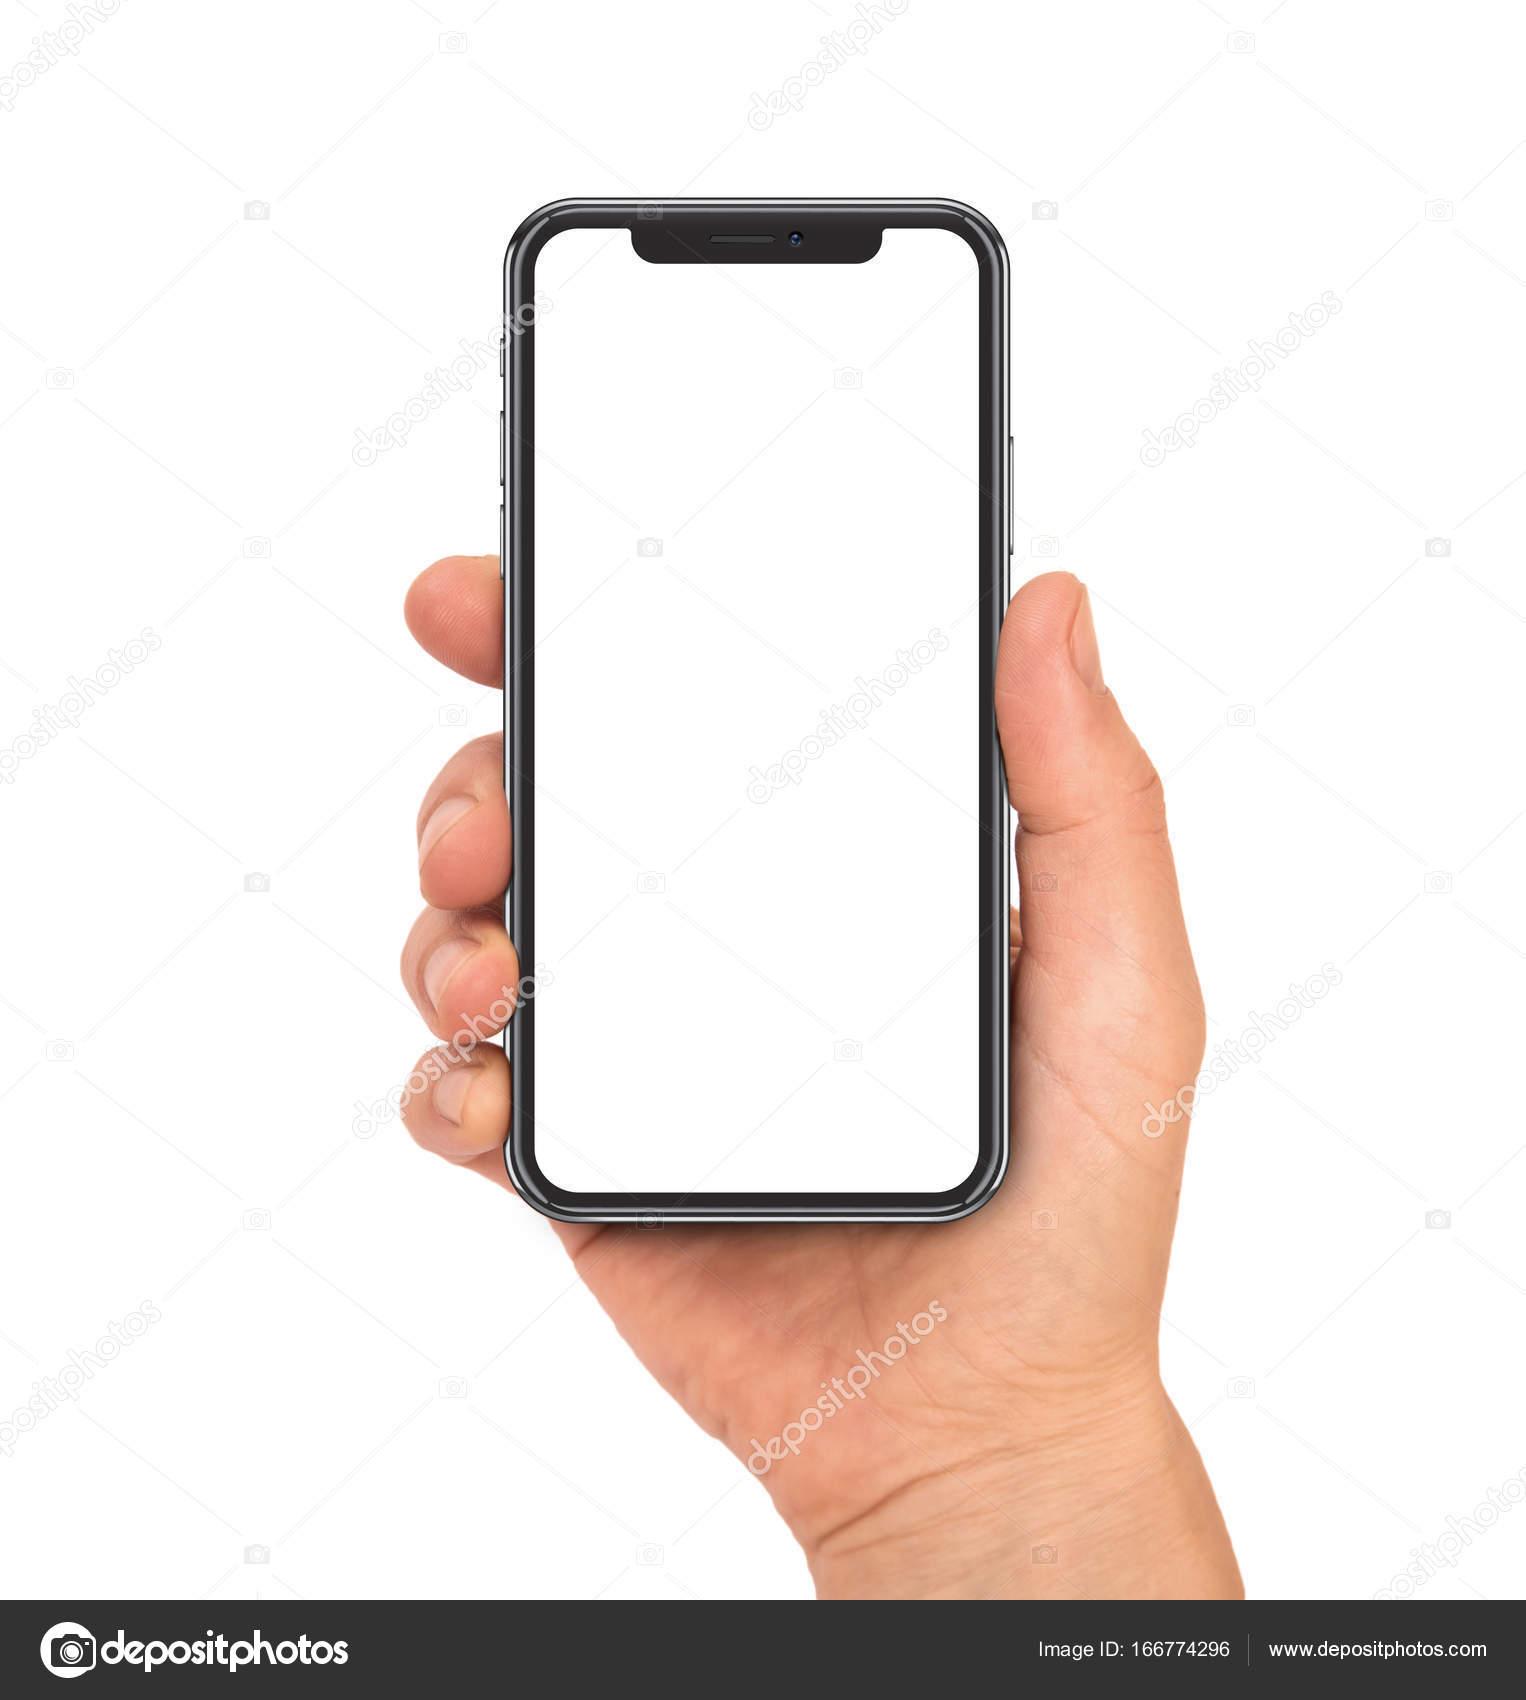 Smartphone hand